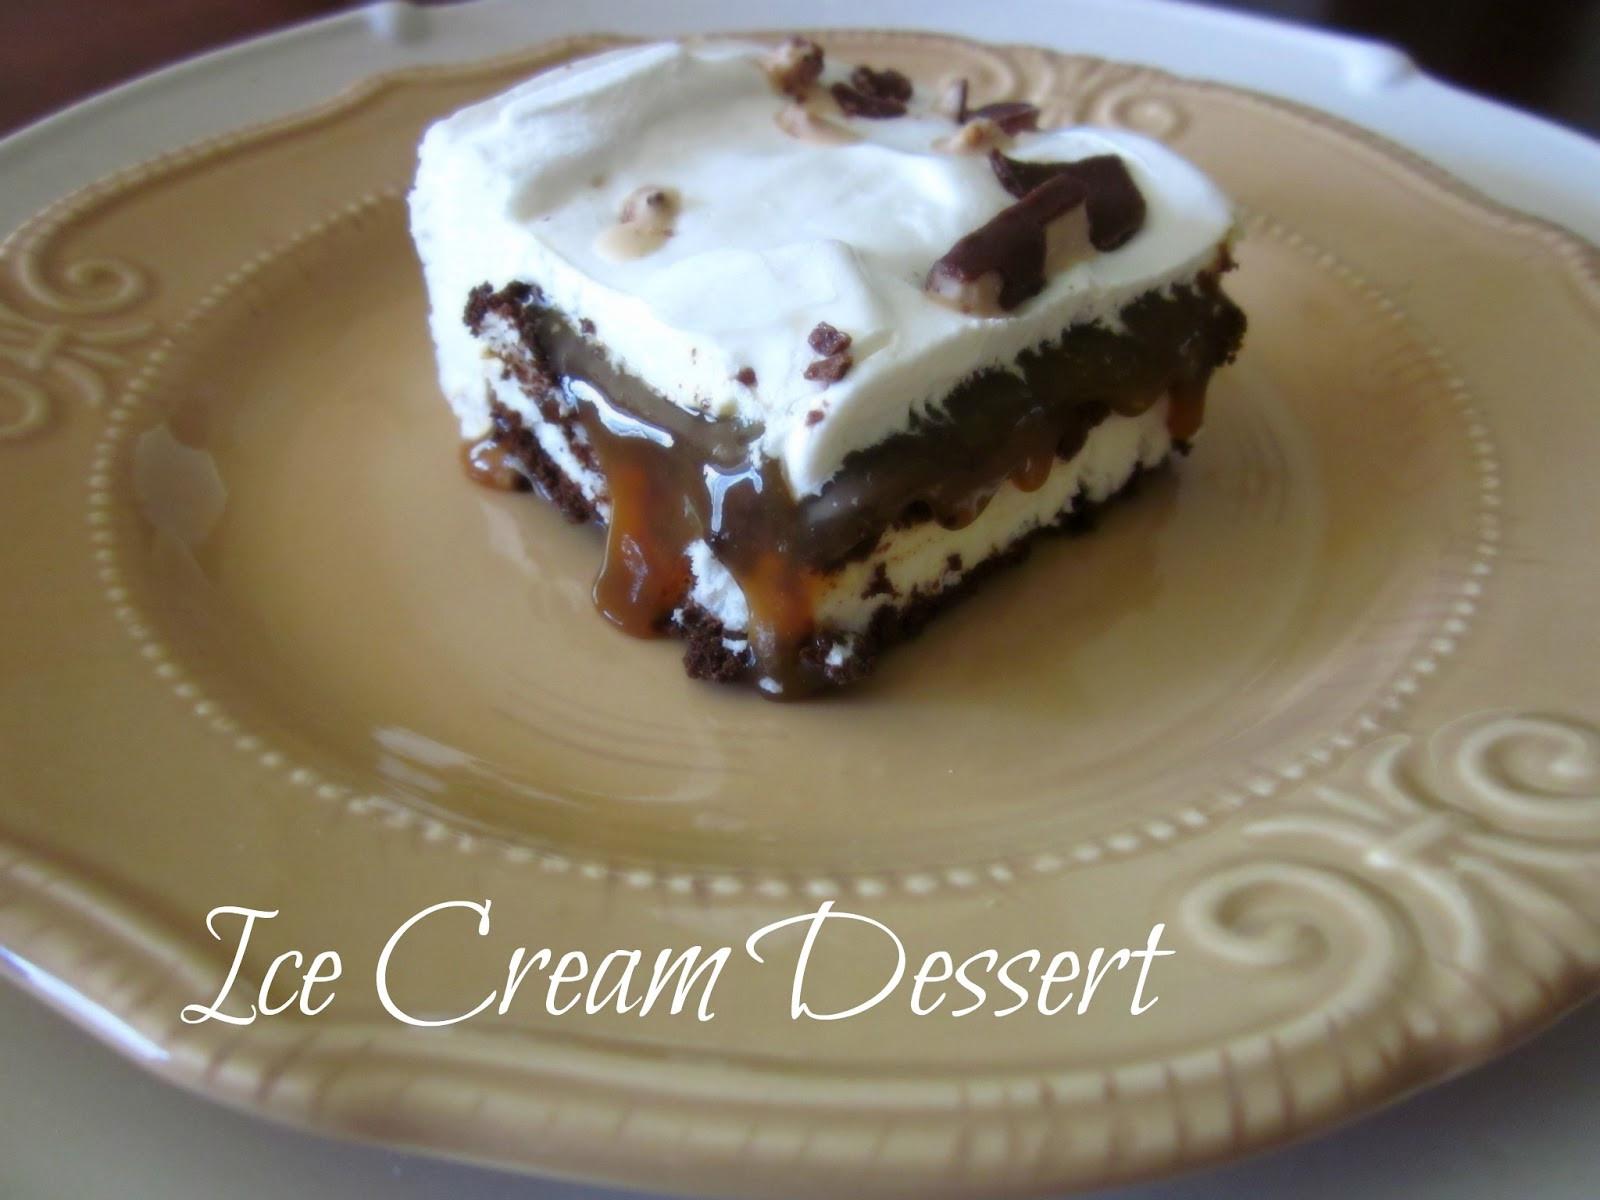 Dessert Ice Cream  Honey I m Home An Easy & Refreshing Ice Cream Dessert